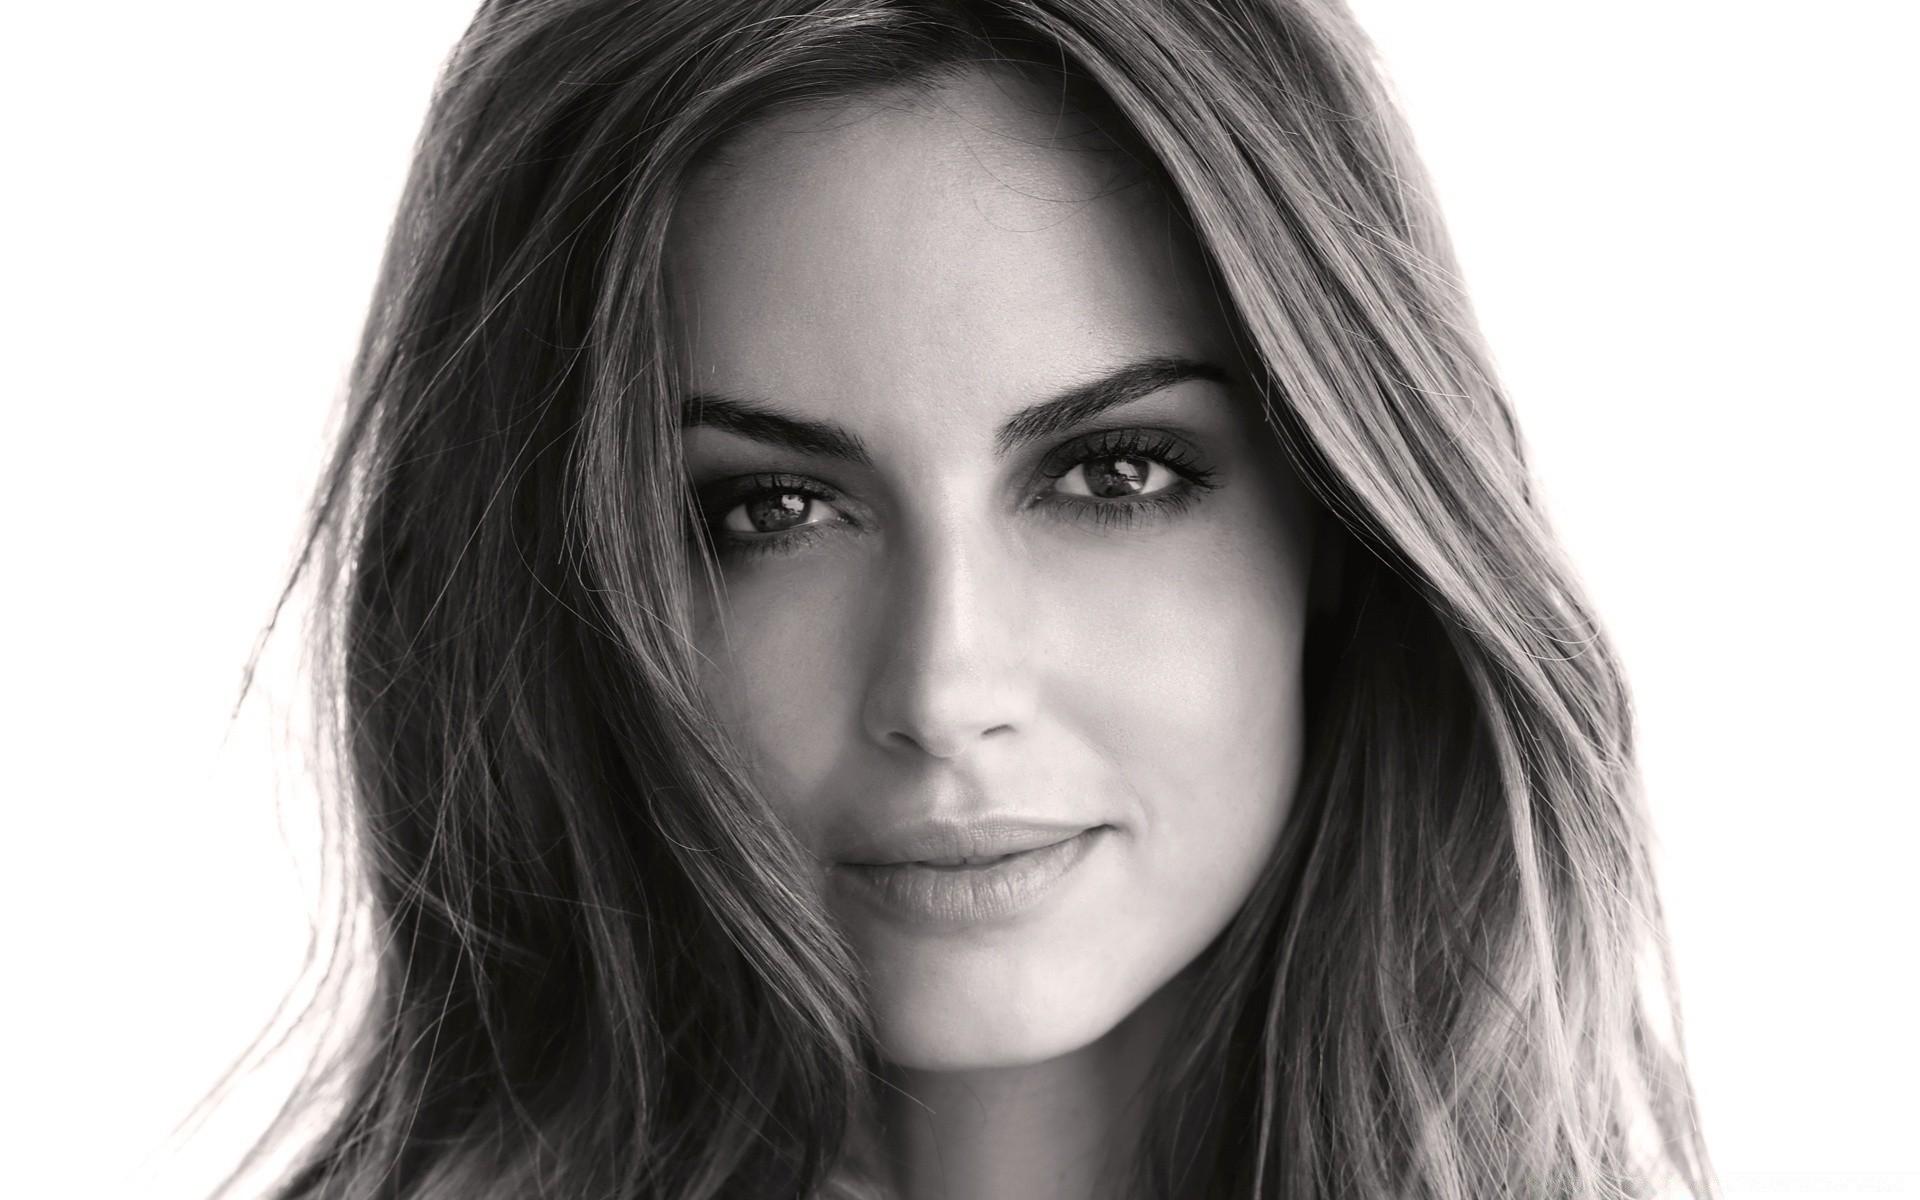 The Other Girls Woman Portrait Fashion Girl Model Eye - Beautiful Woman Face Black And White - HD Wallpaper